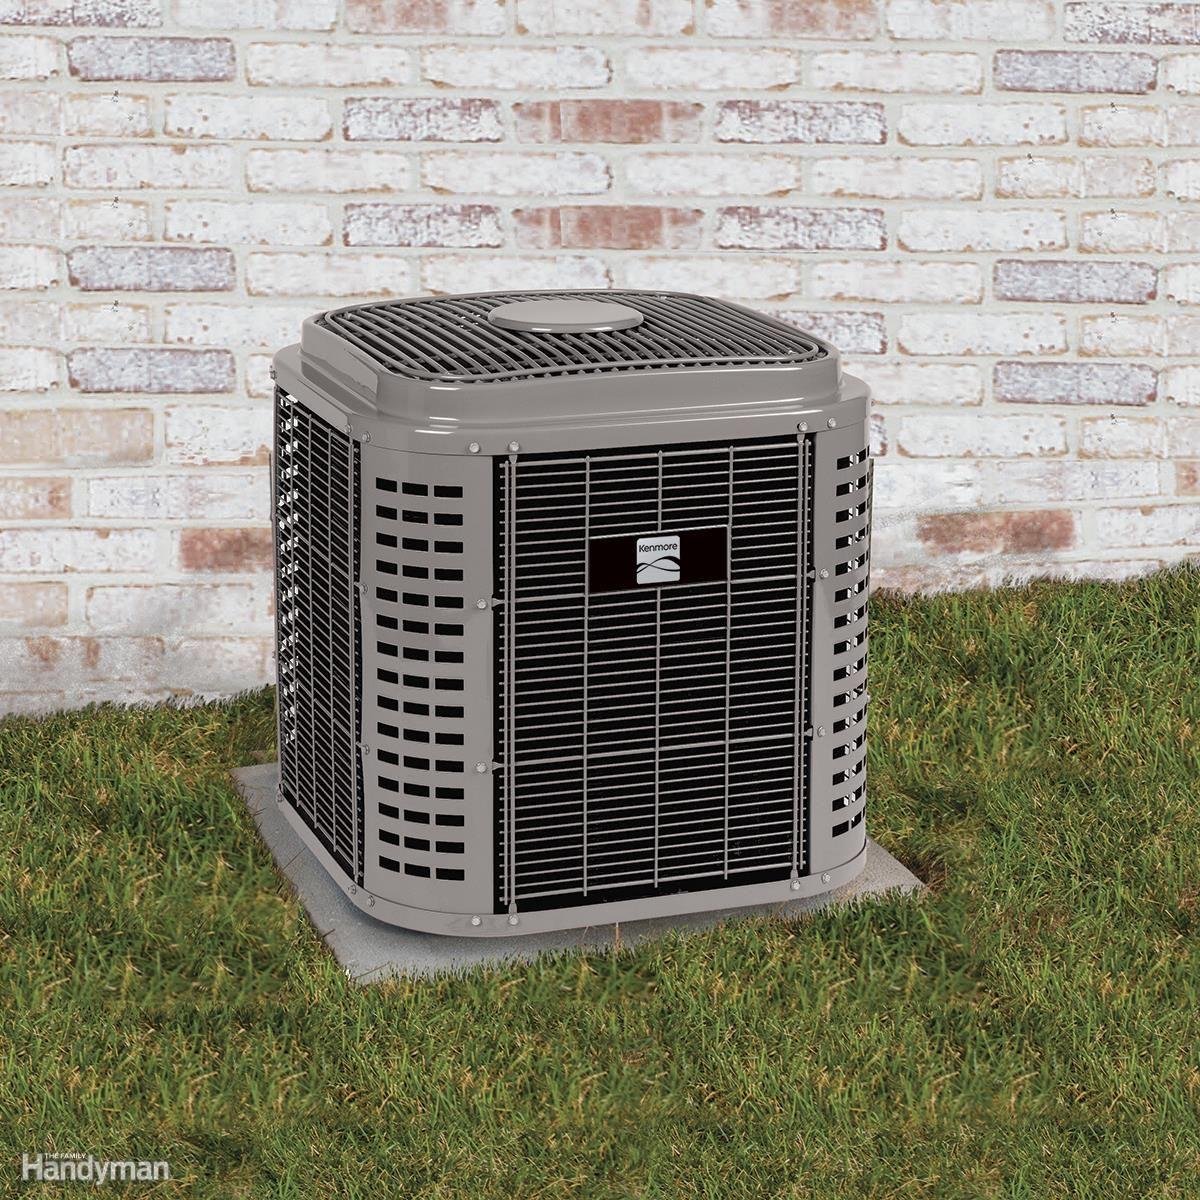 Air Conditioner Repair Air conditioner repair, Hvac